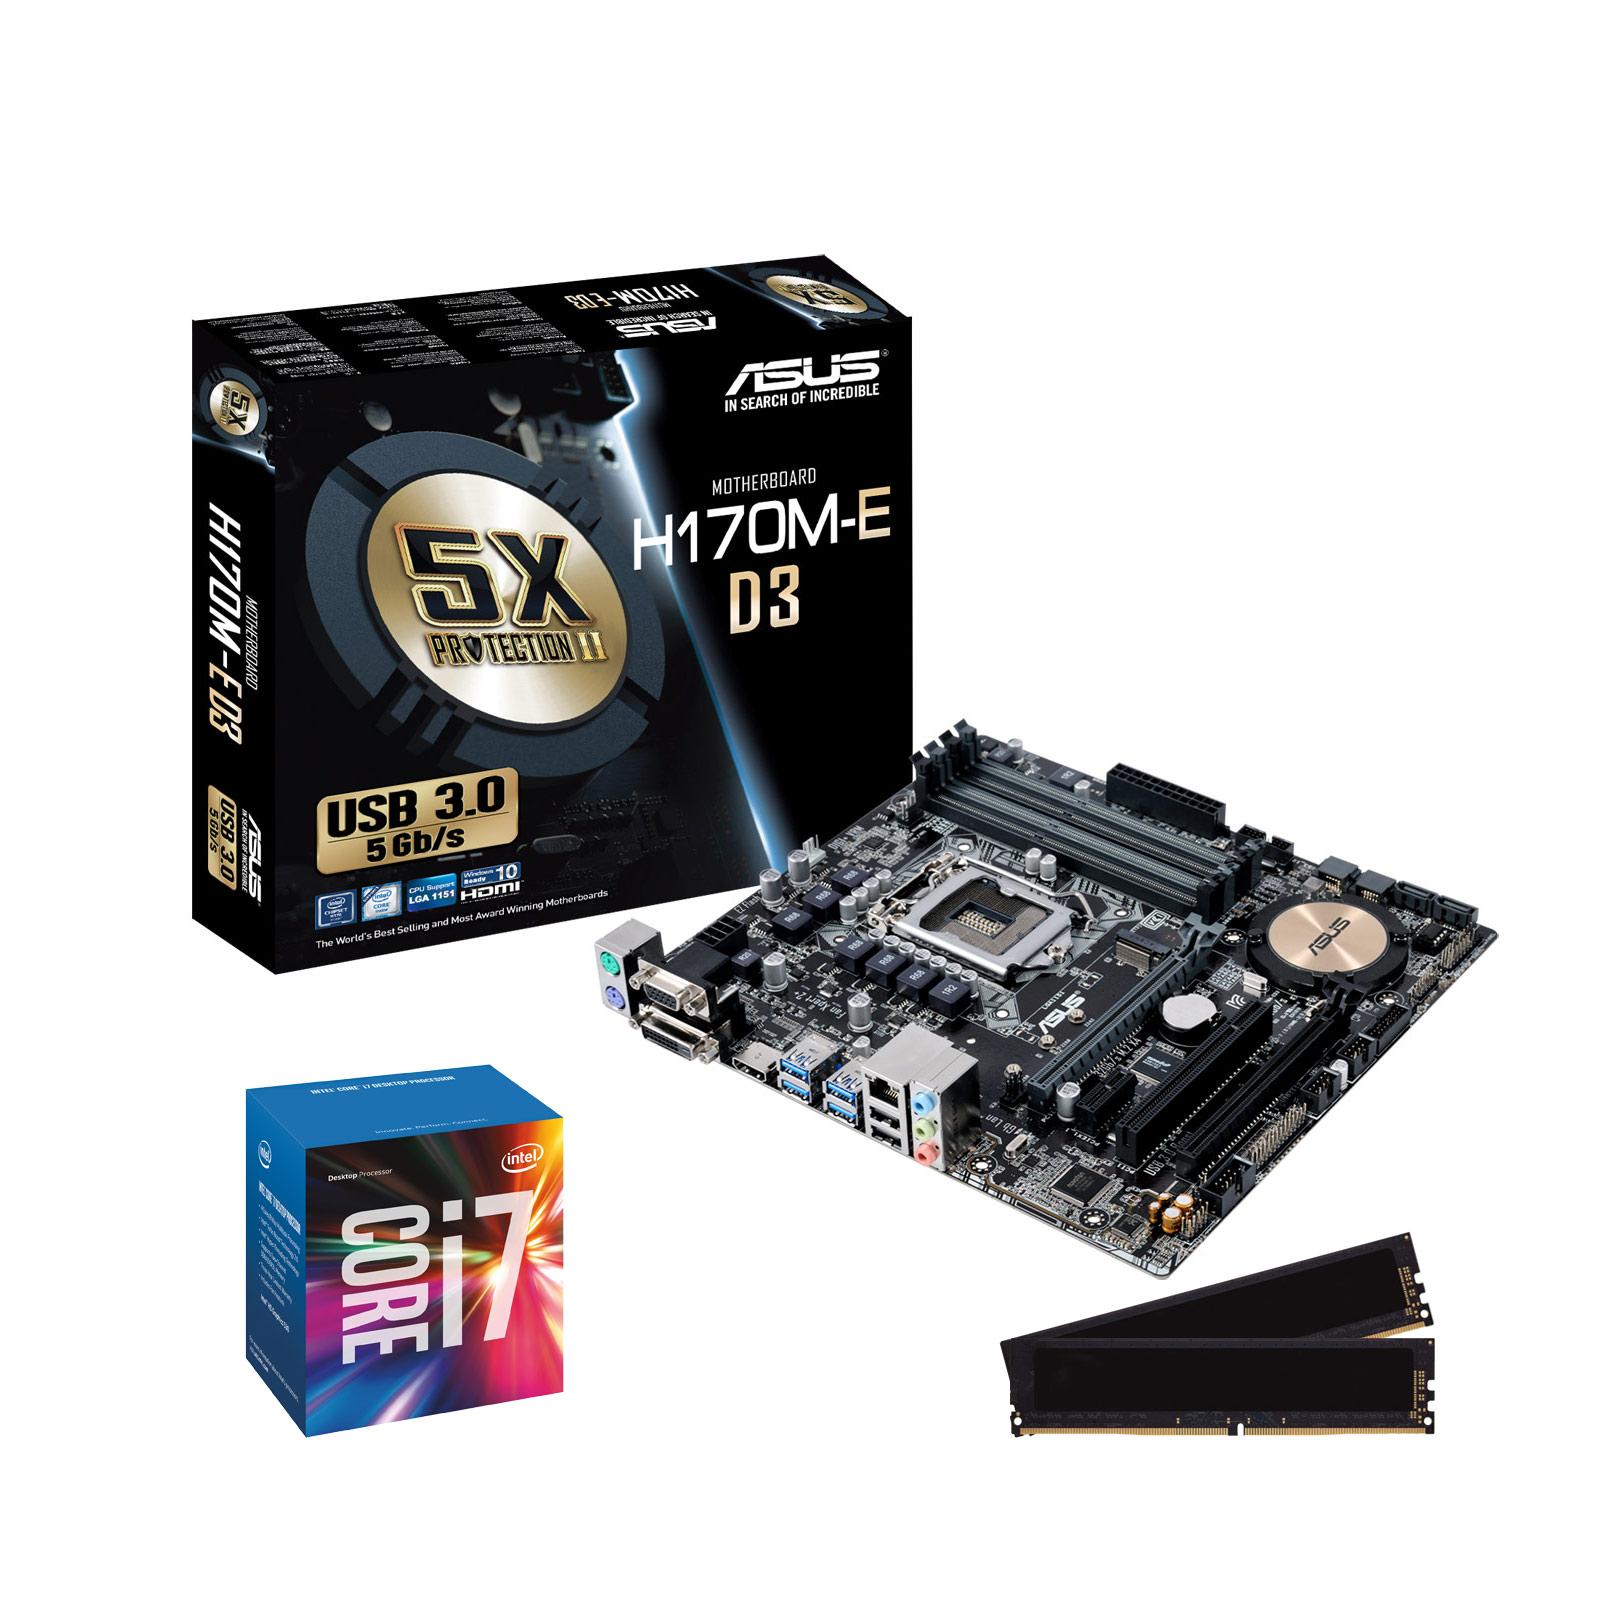 Kit Upgrade PC Core i7 ASUS H170M-E D3 8 Go (KIT UPG ASUS ...